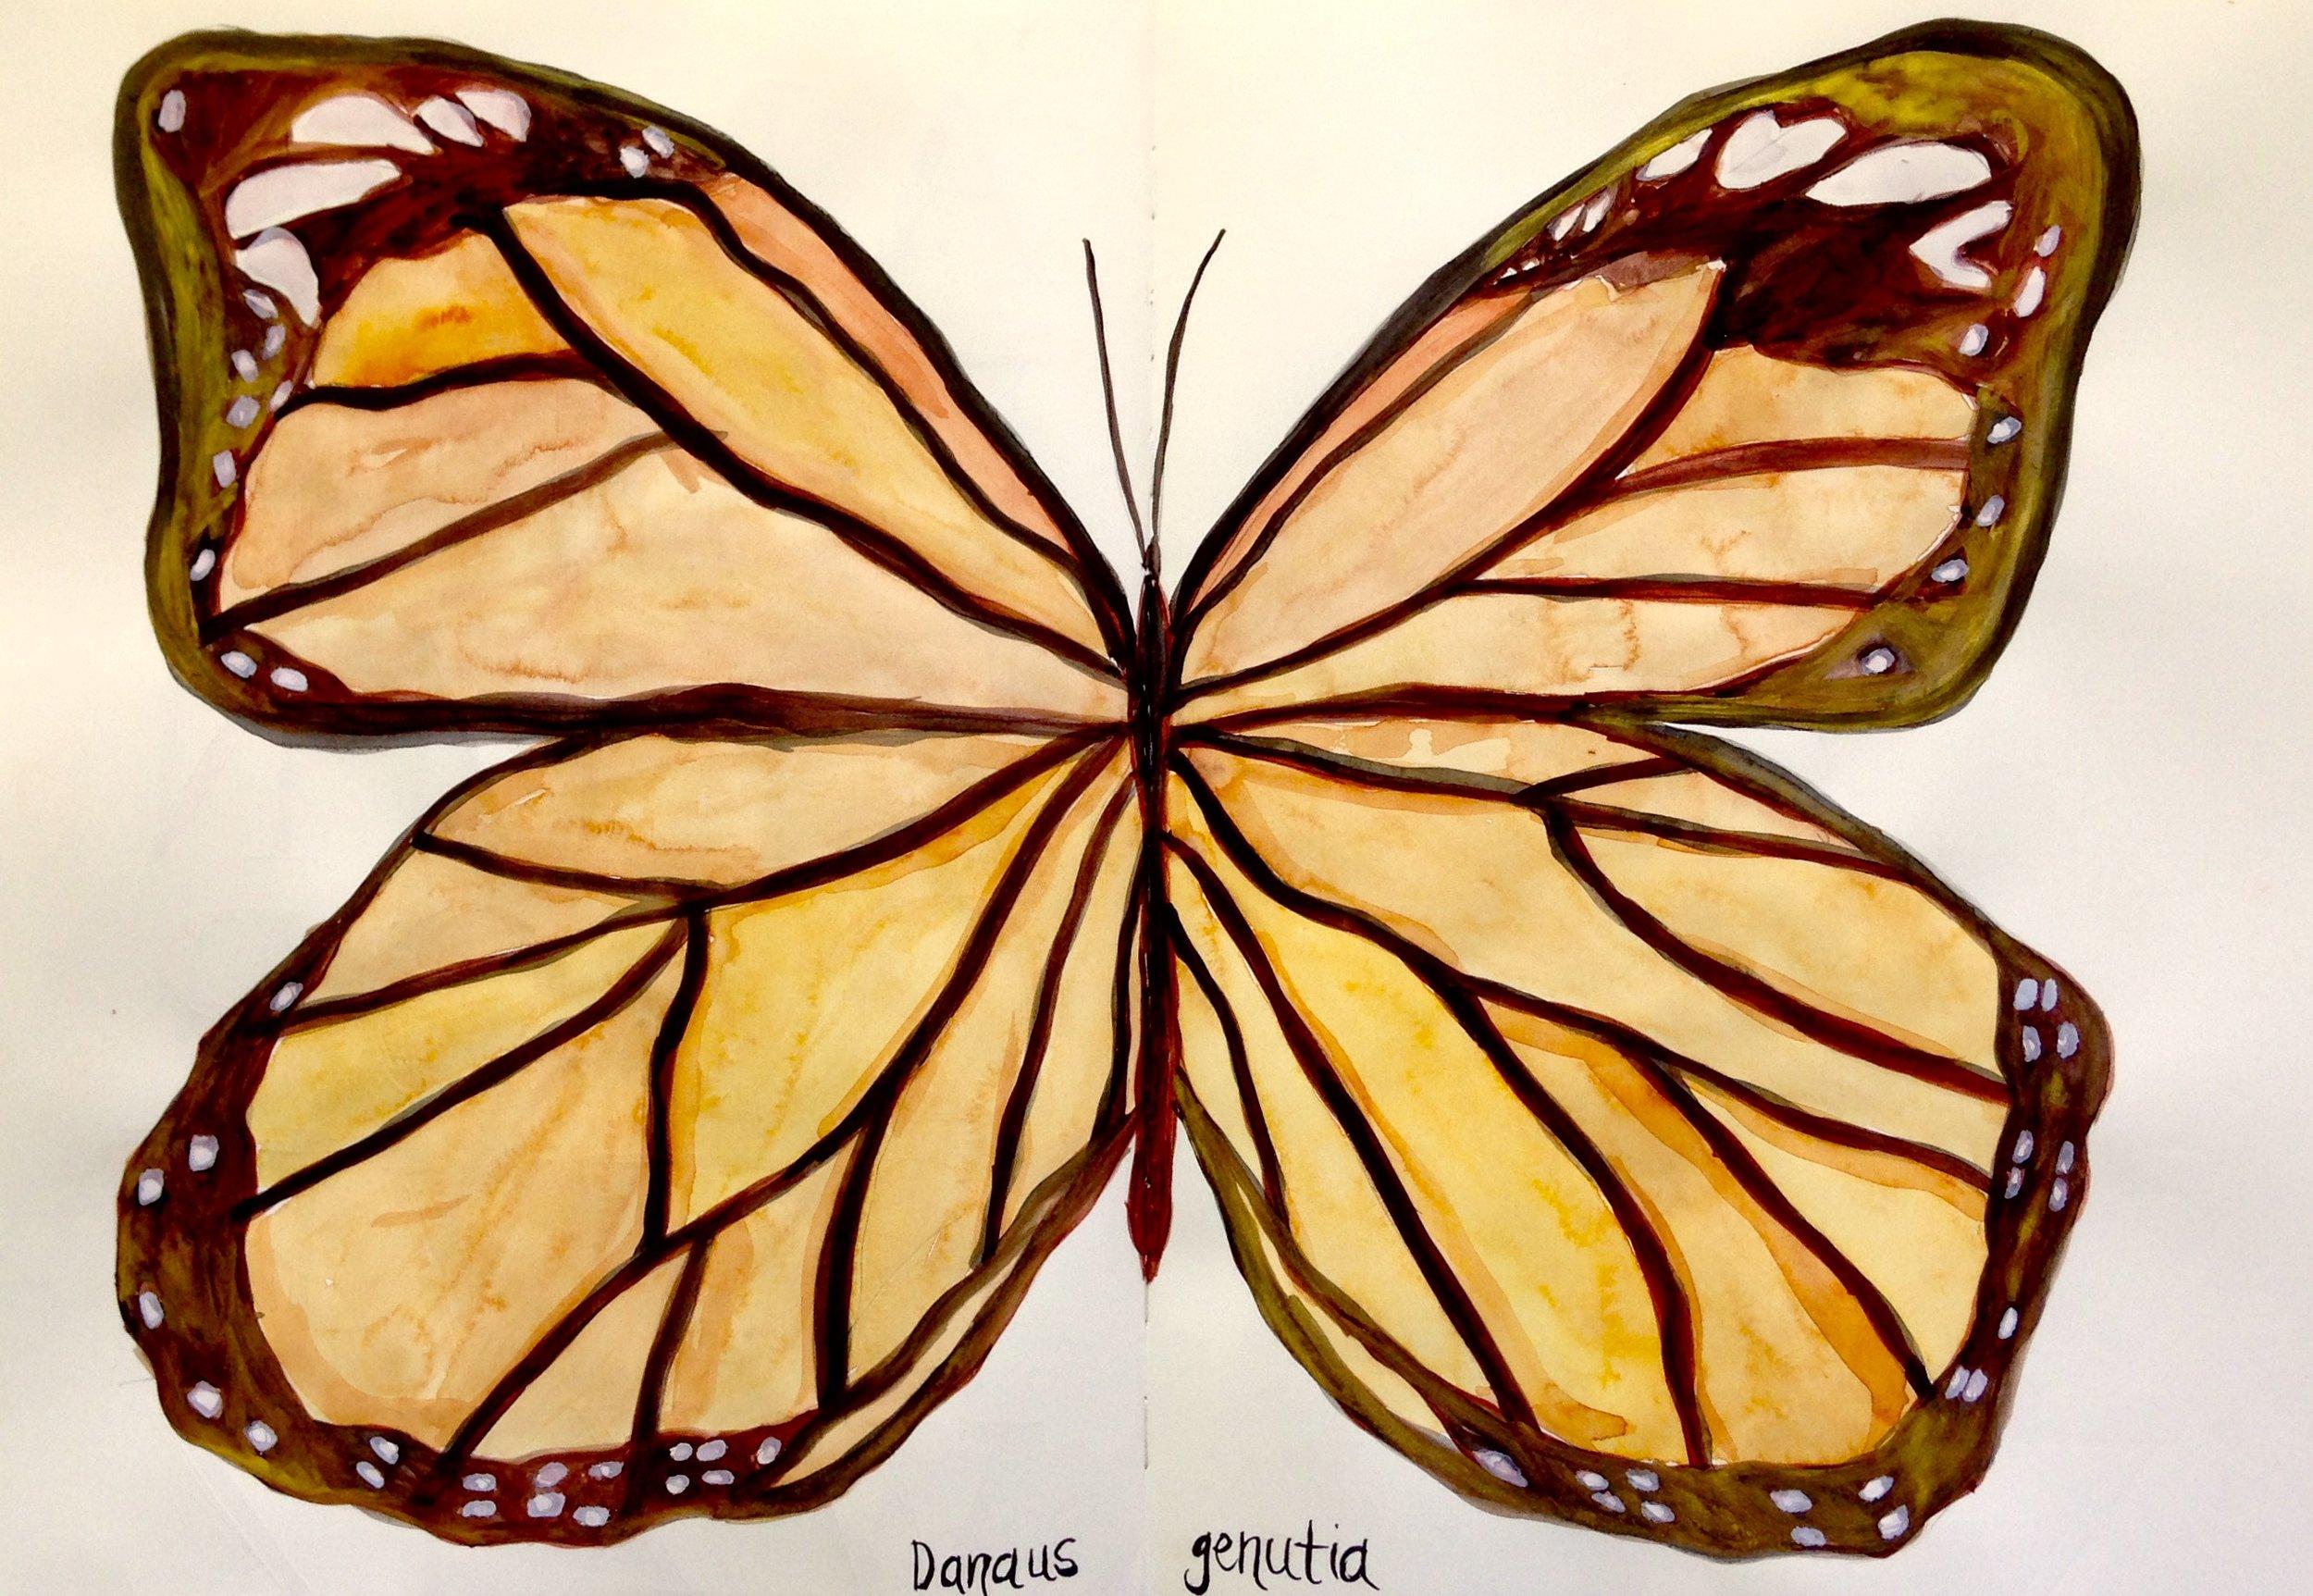 Danaus Genutia, 2017  watercolor on paper